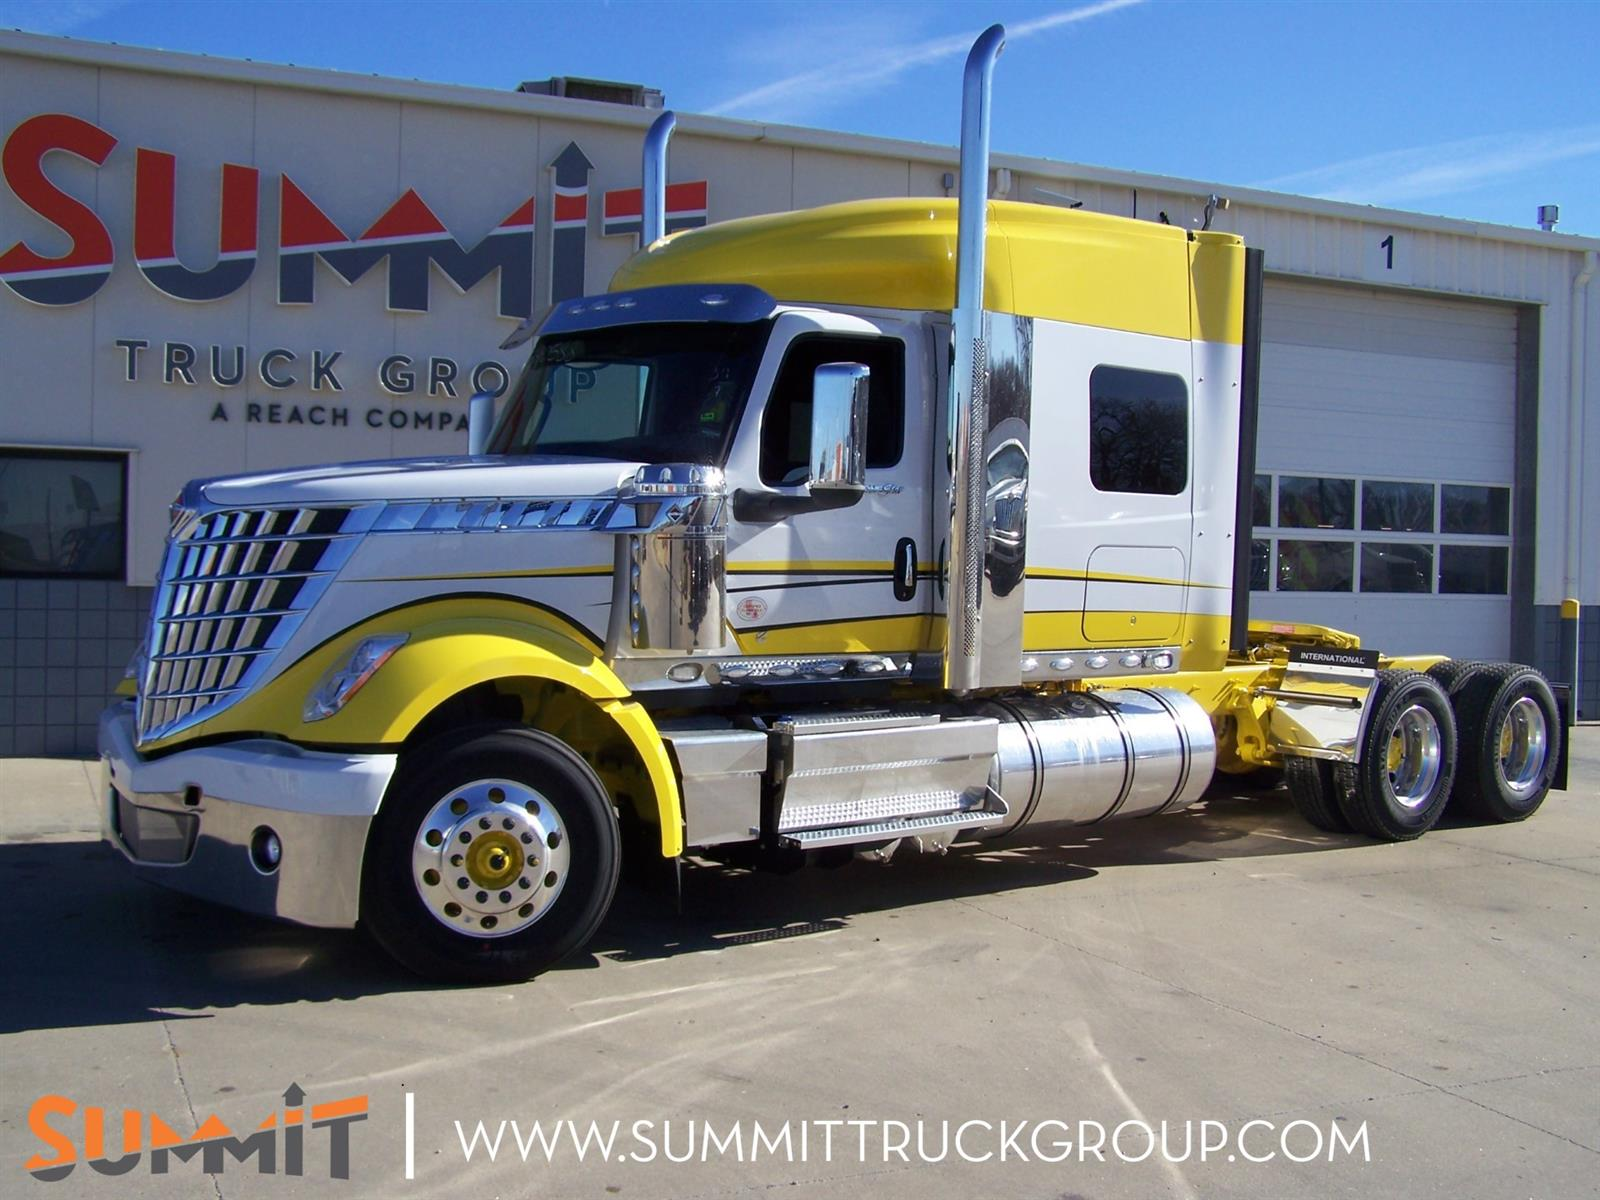 2021 International LoneStar Sleeper Cab 6x4, Tractor #MN590588 - photo 1